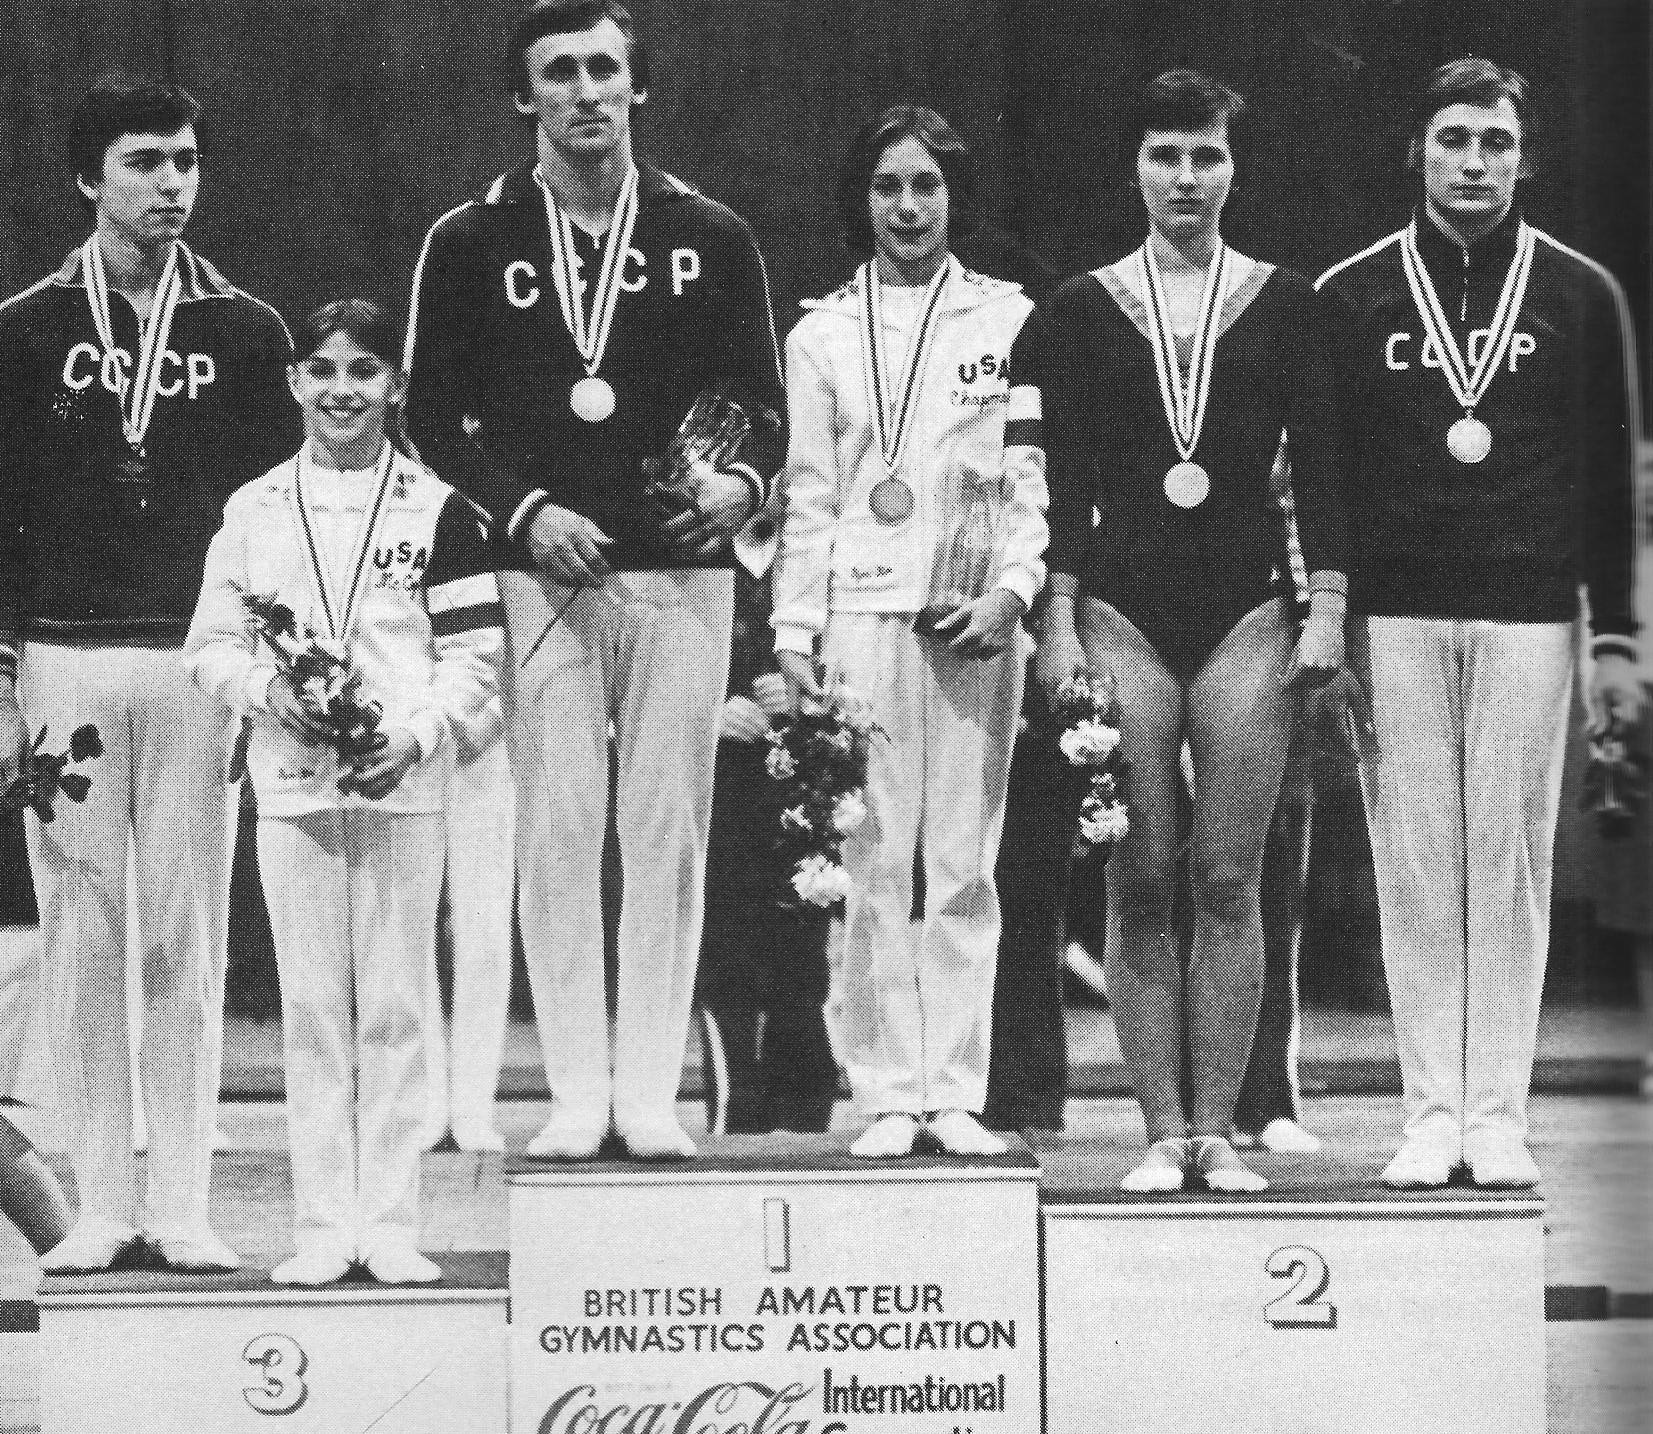 British amateur gymnastics association all became